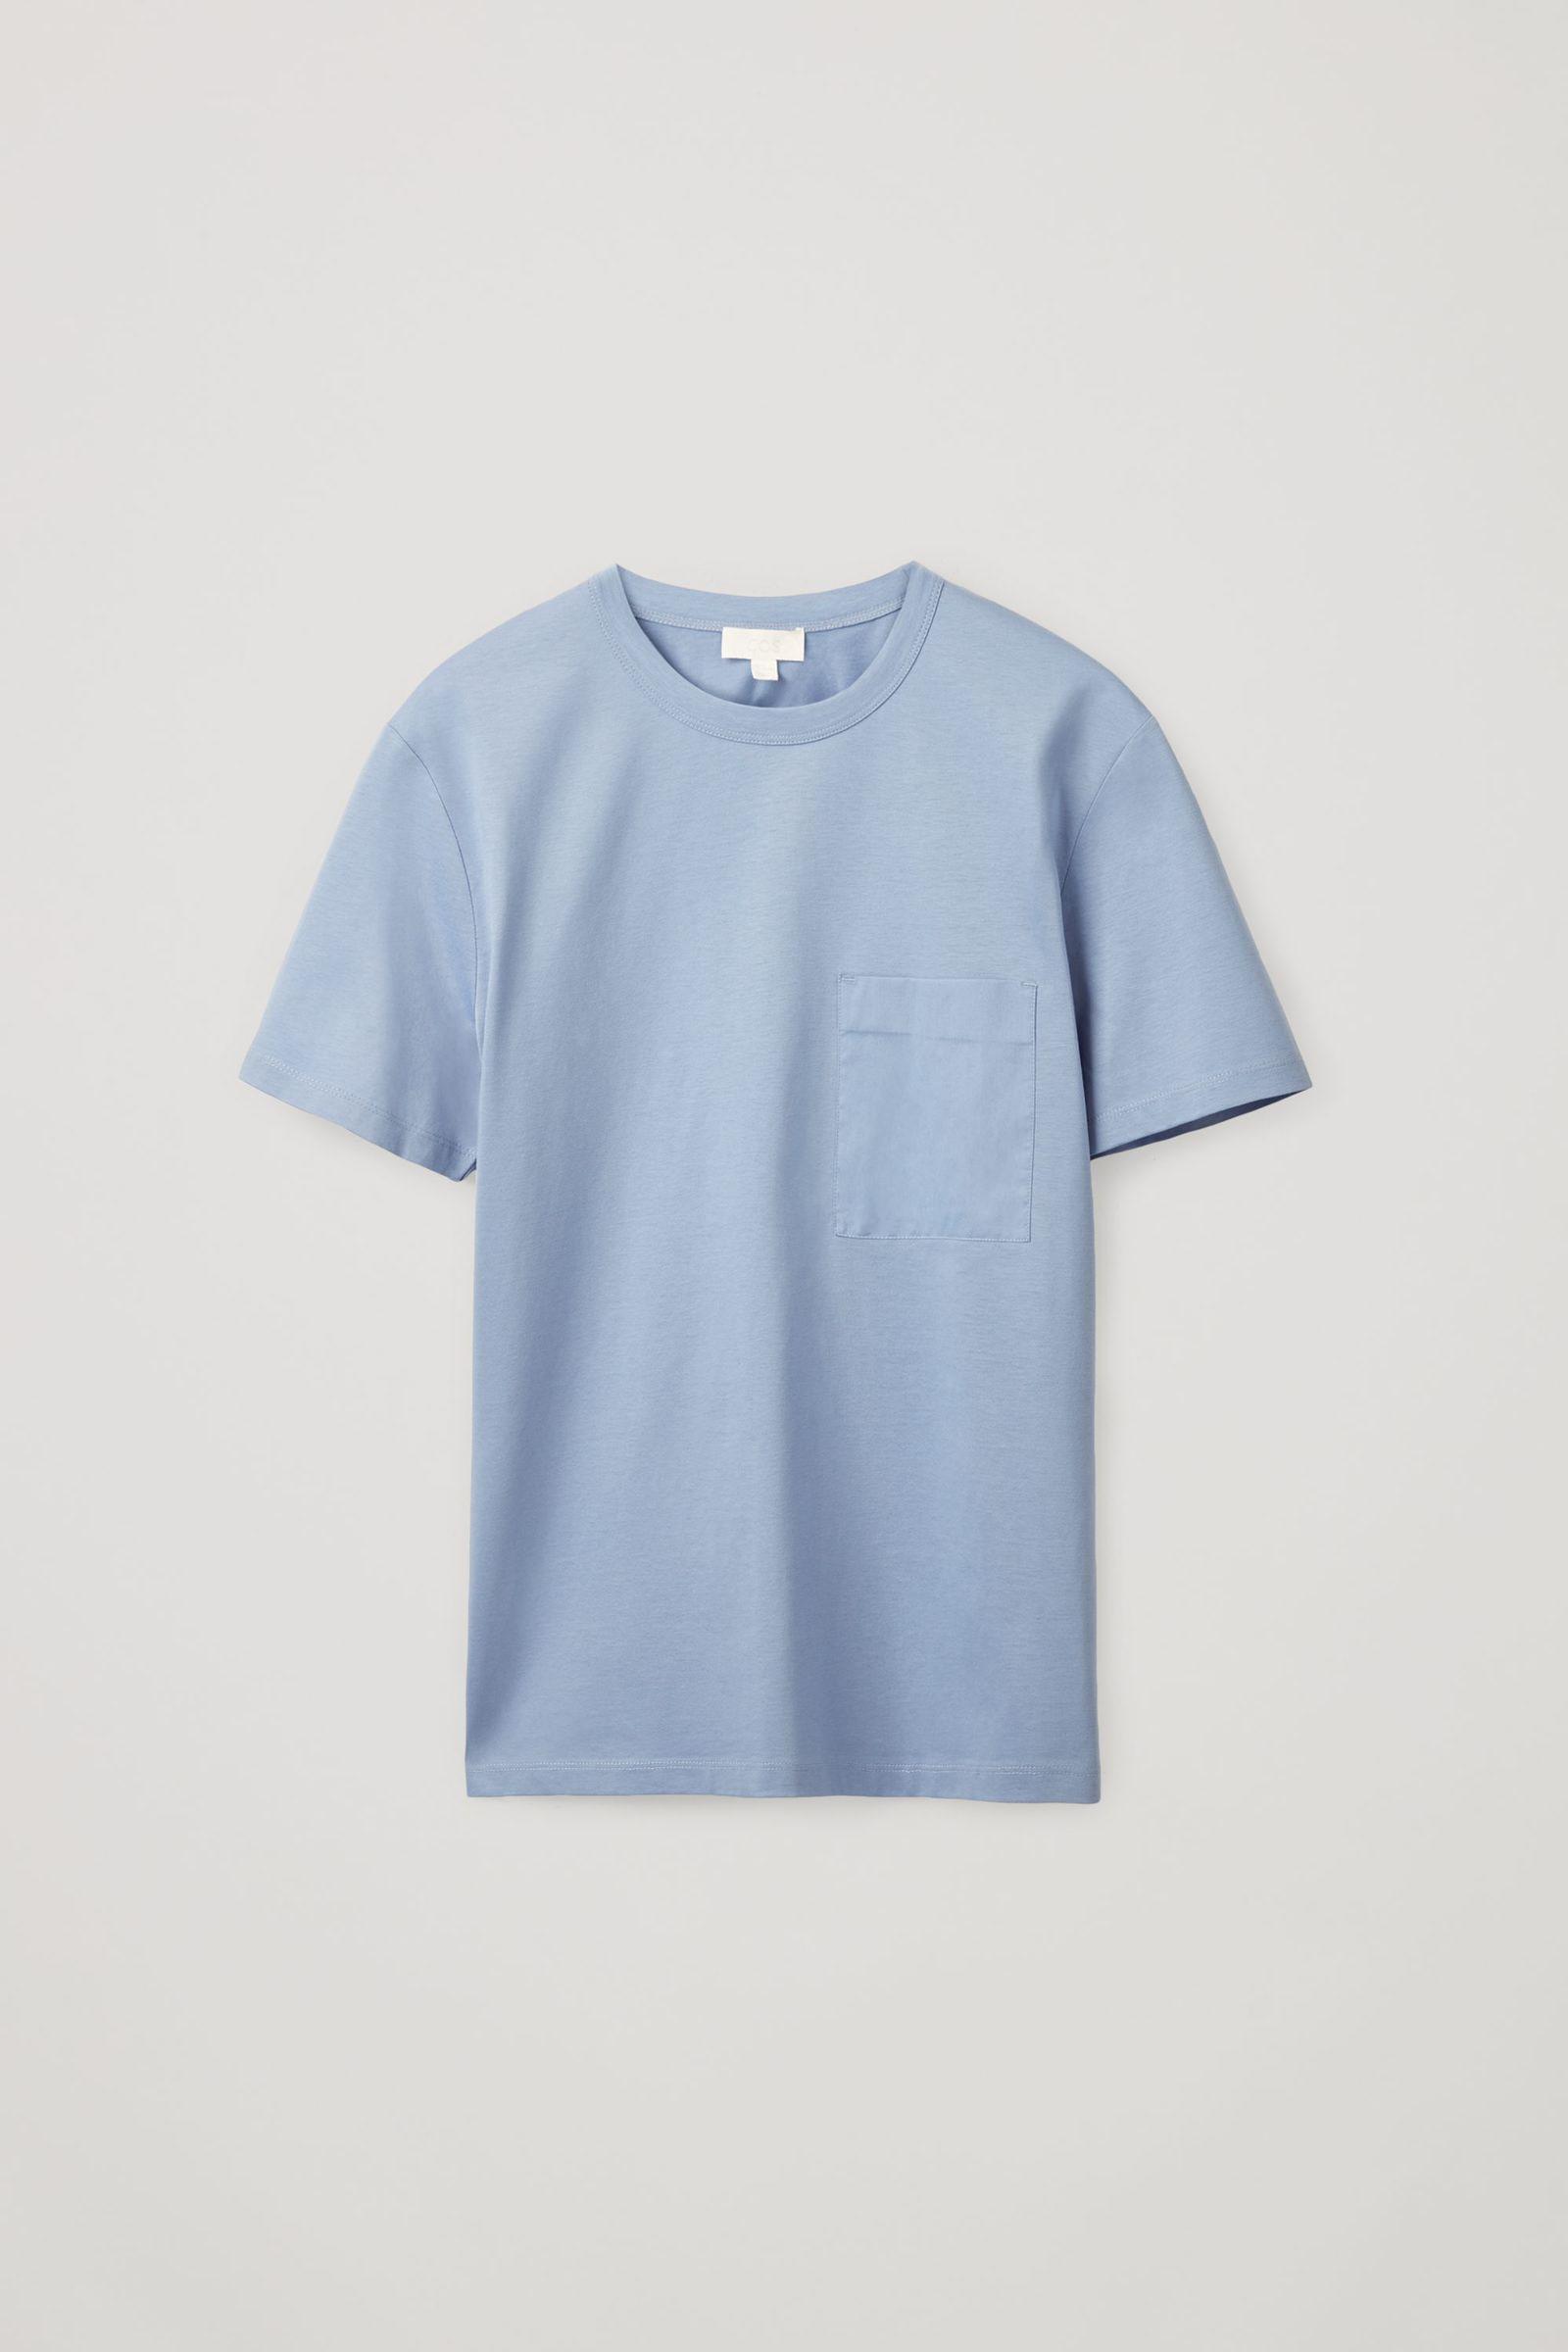 COS 패치 포켓 티셔츠의 블루컬러 Product입니다.